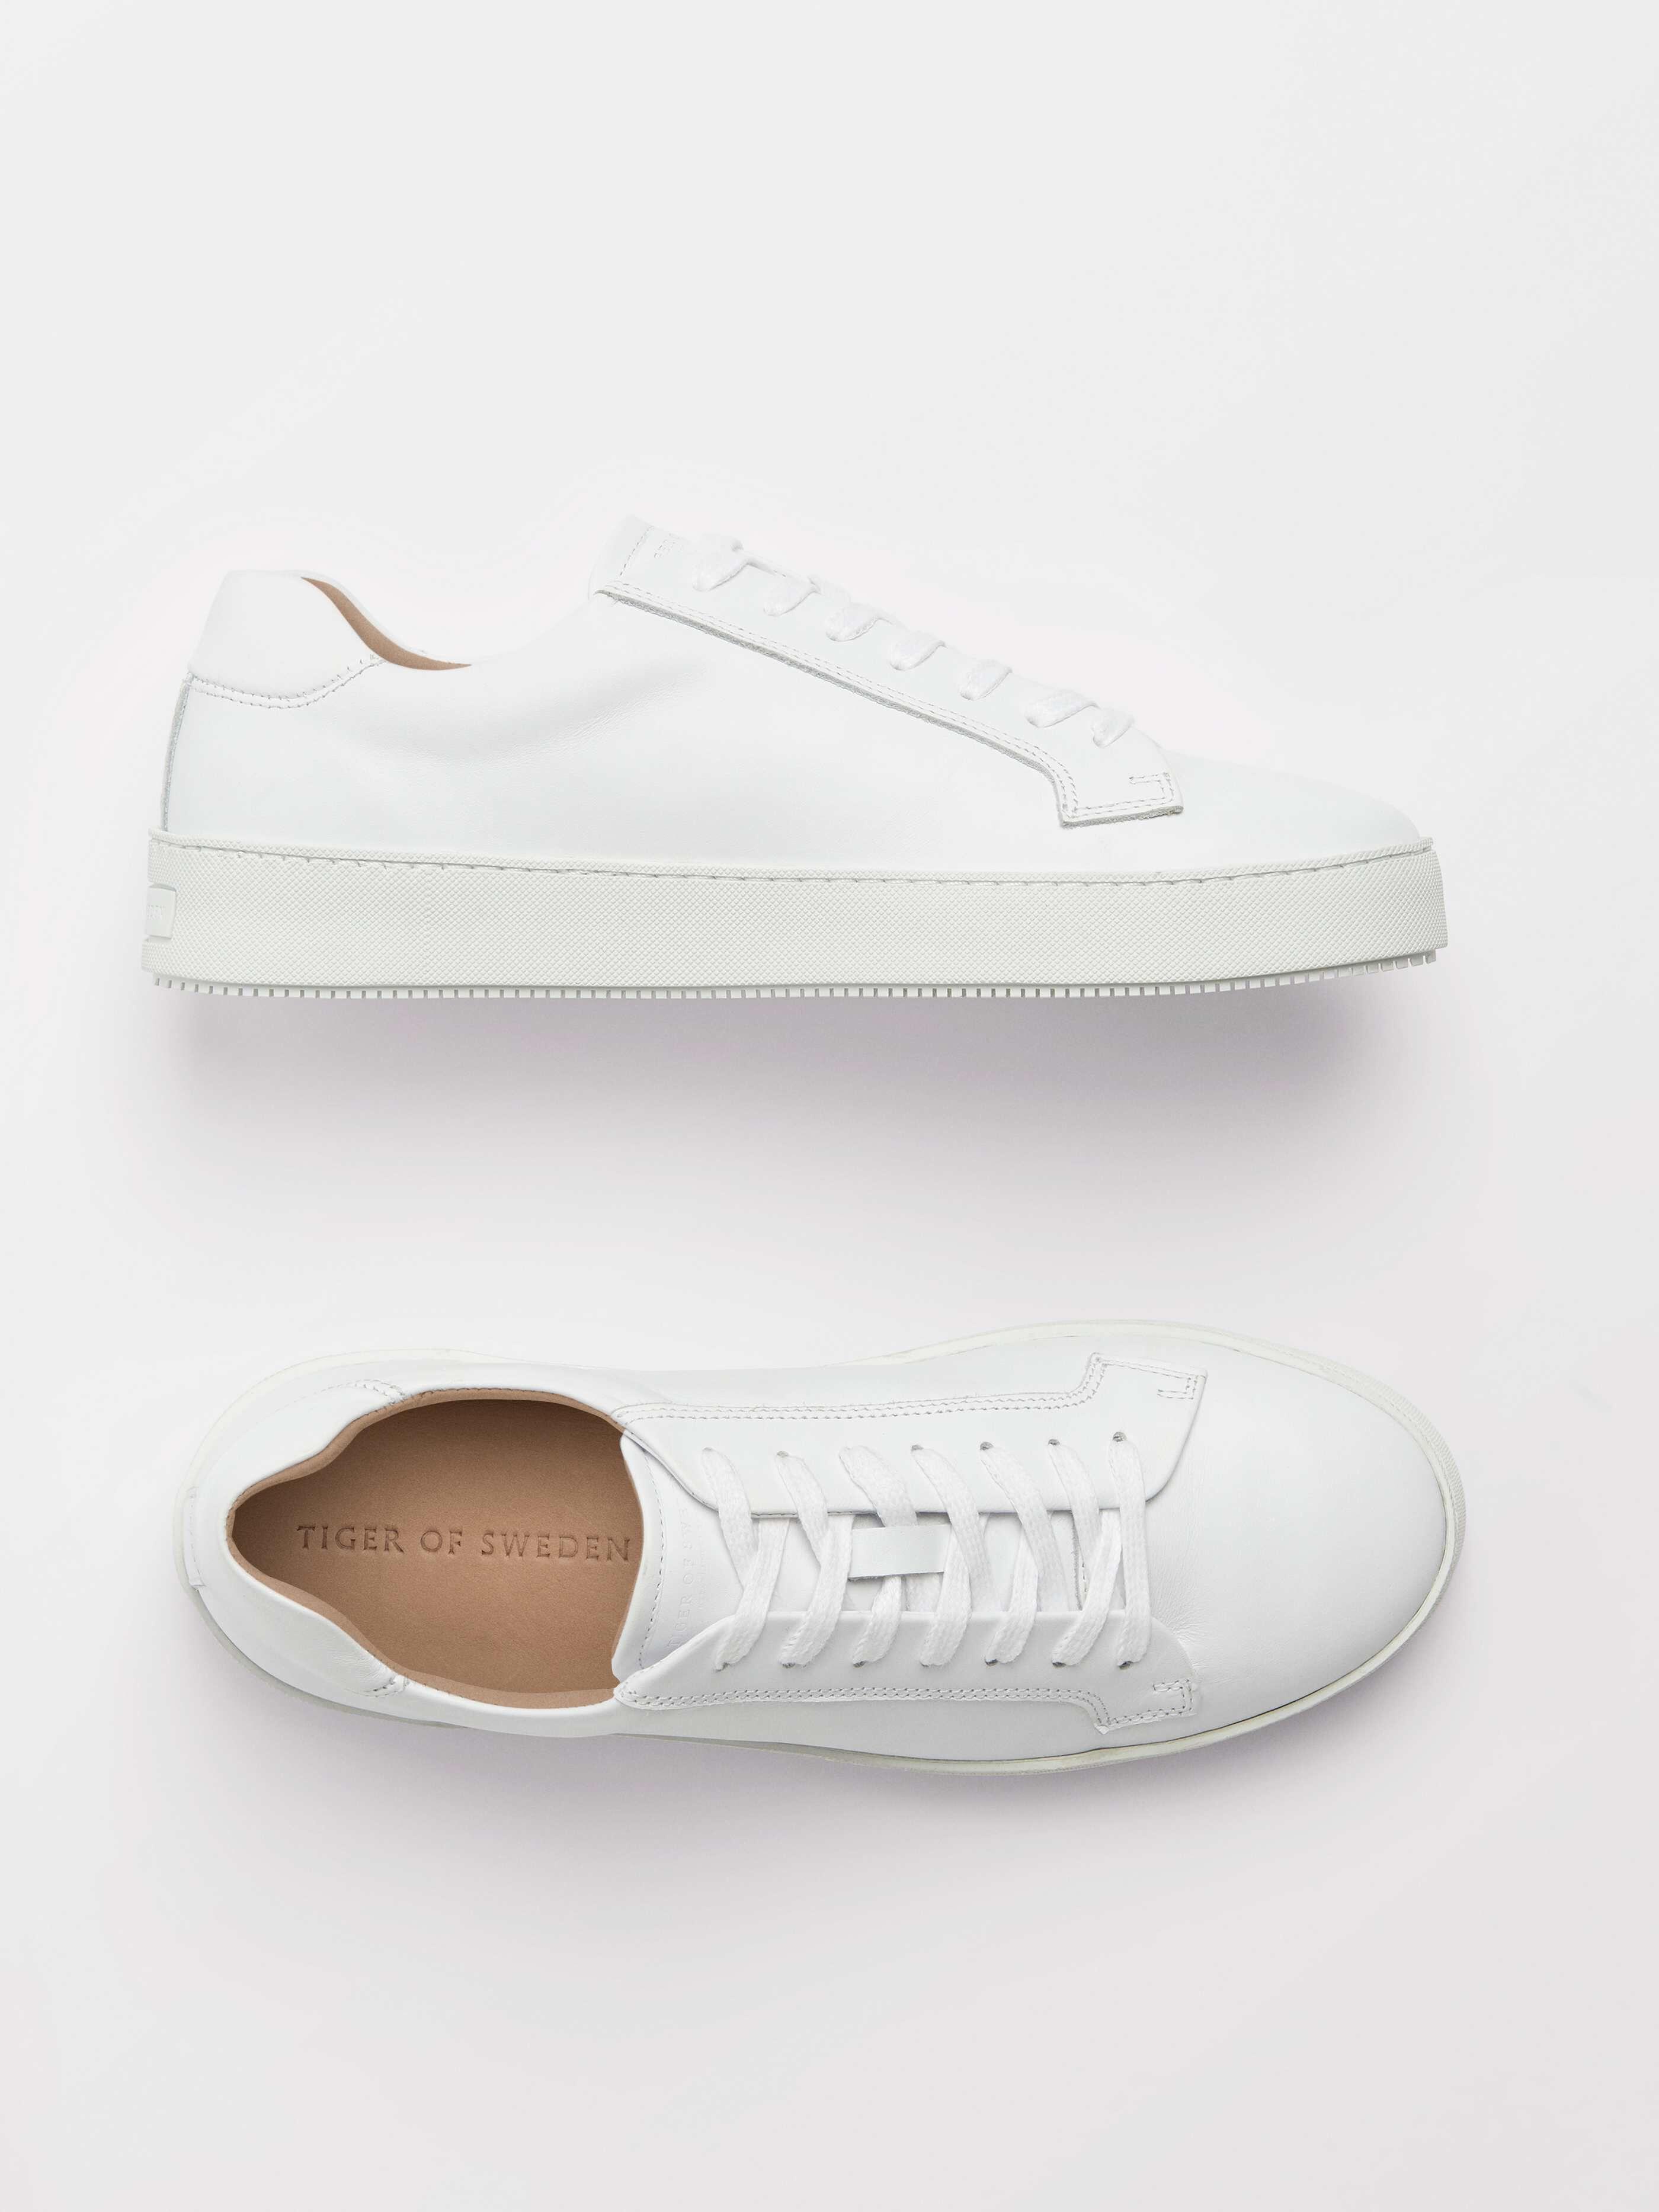 Salas Sneaker - Schuhe Online kaufen